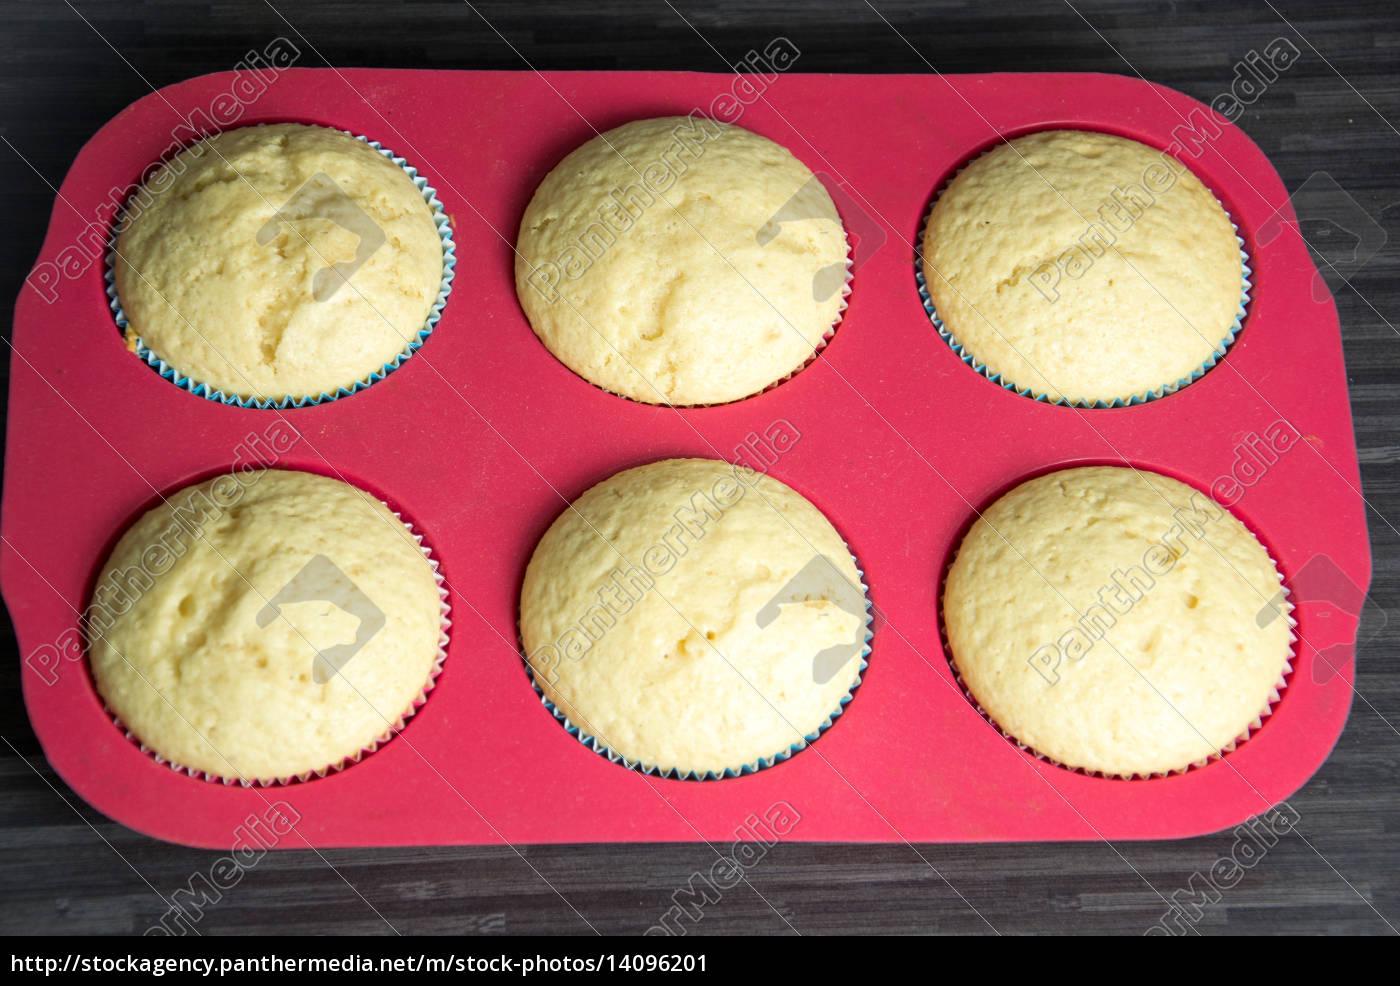 muffins - 14096201